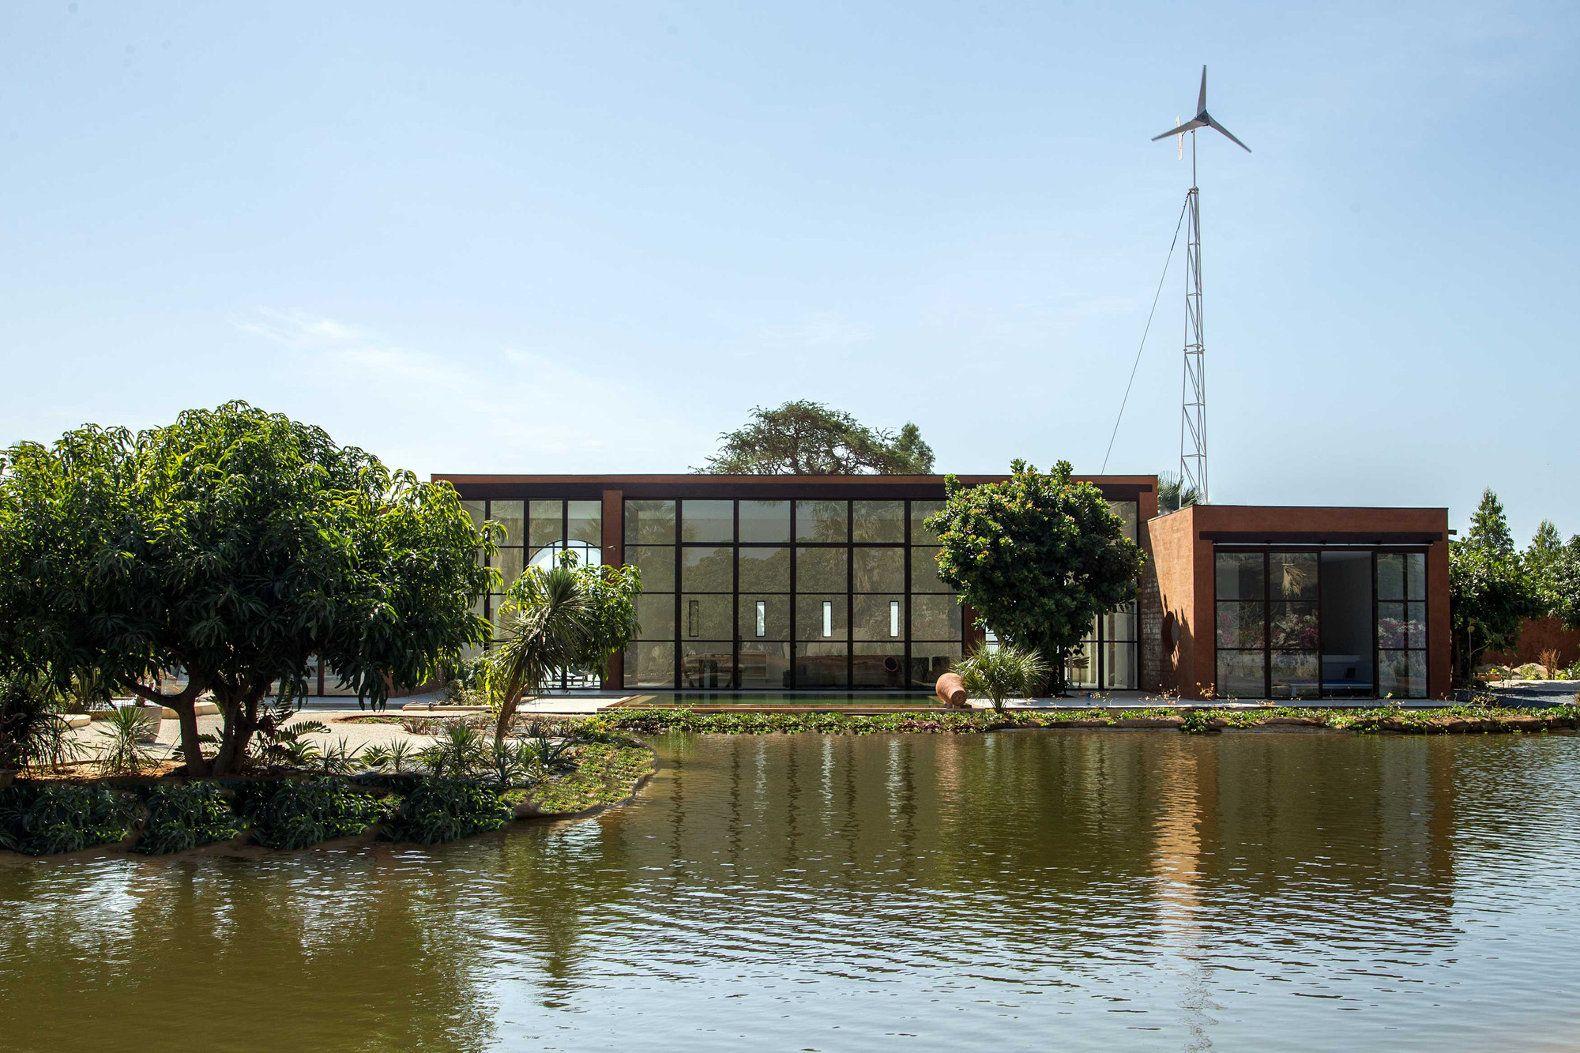 Khamsa-home-by-Atelier-Koe-exterior-turbine.jpg (1580×1053)